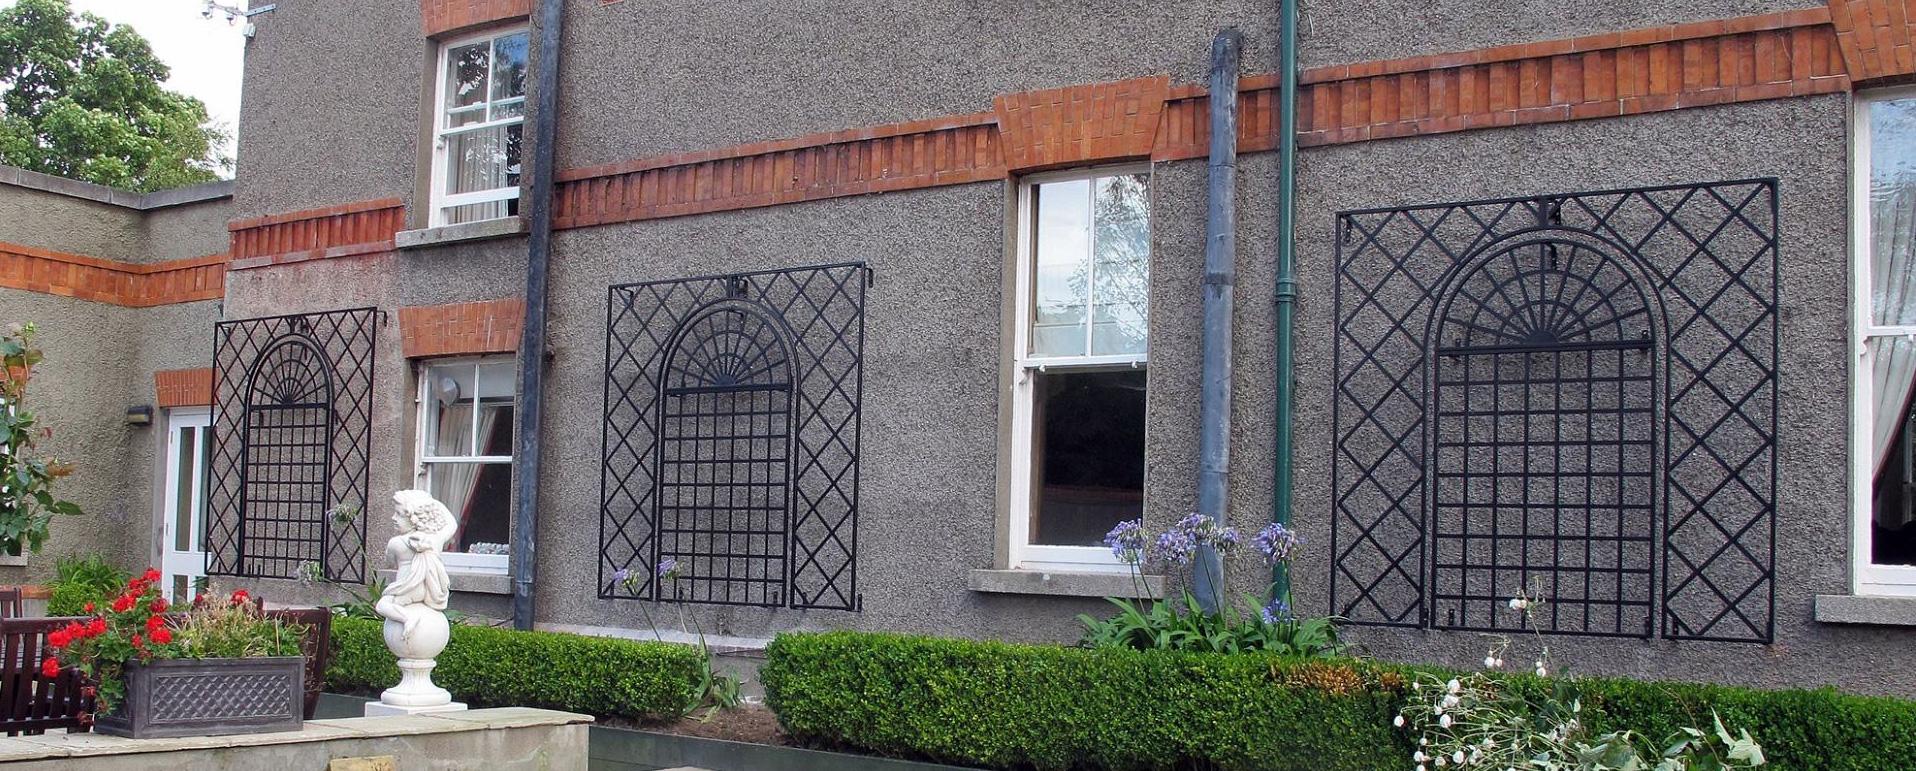 treillage wall trellis classic garden elements uk. Black Bedroom Furniture Sets. Home Design Ideas